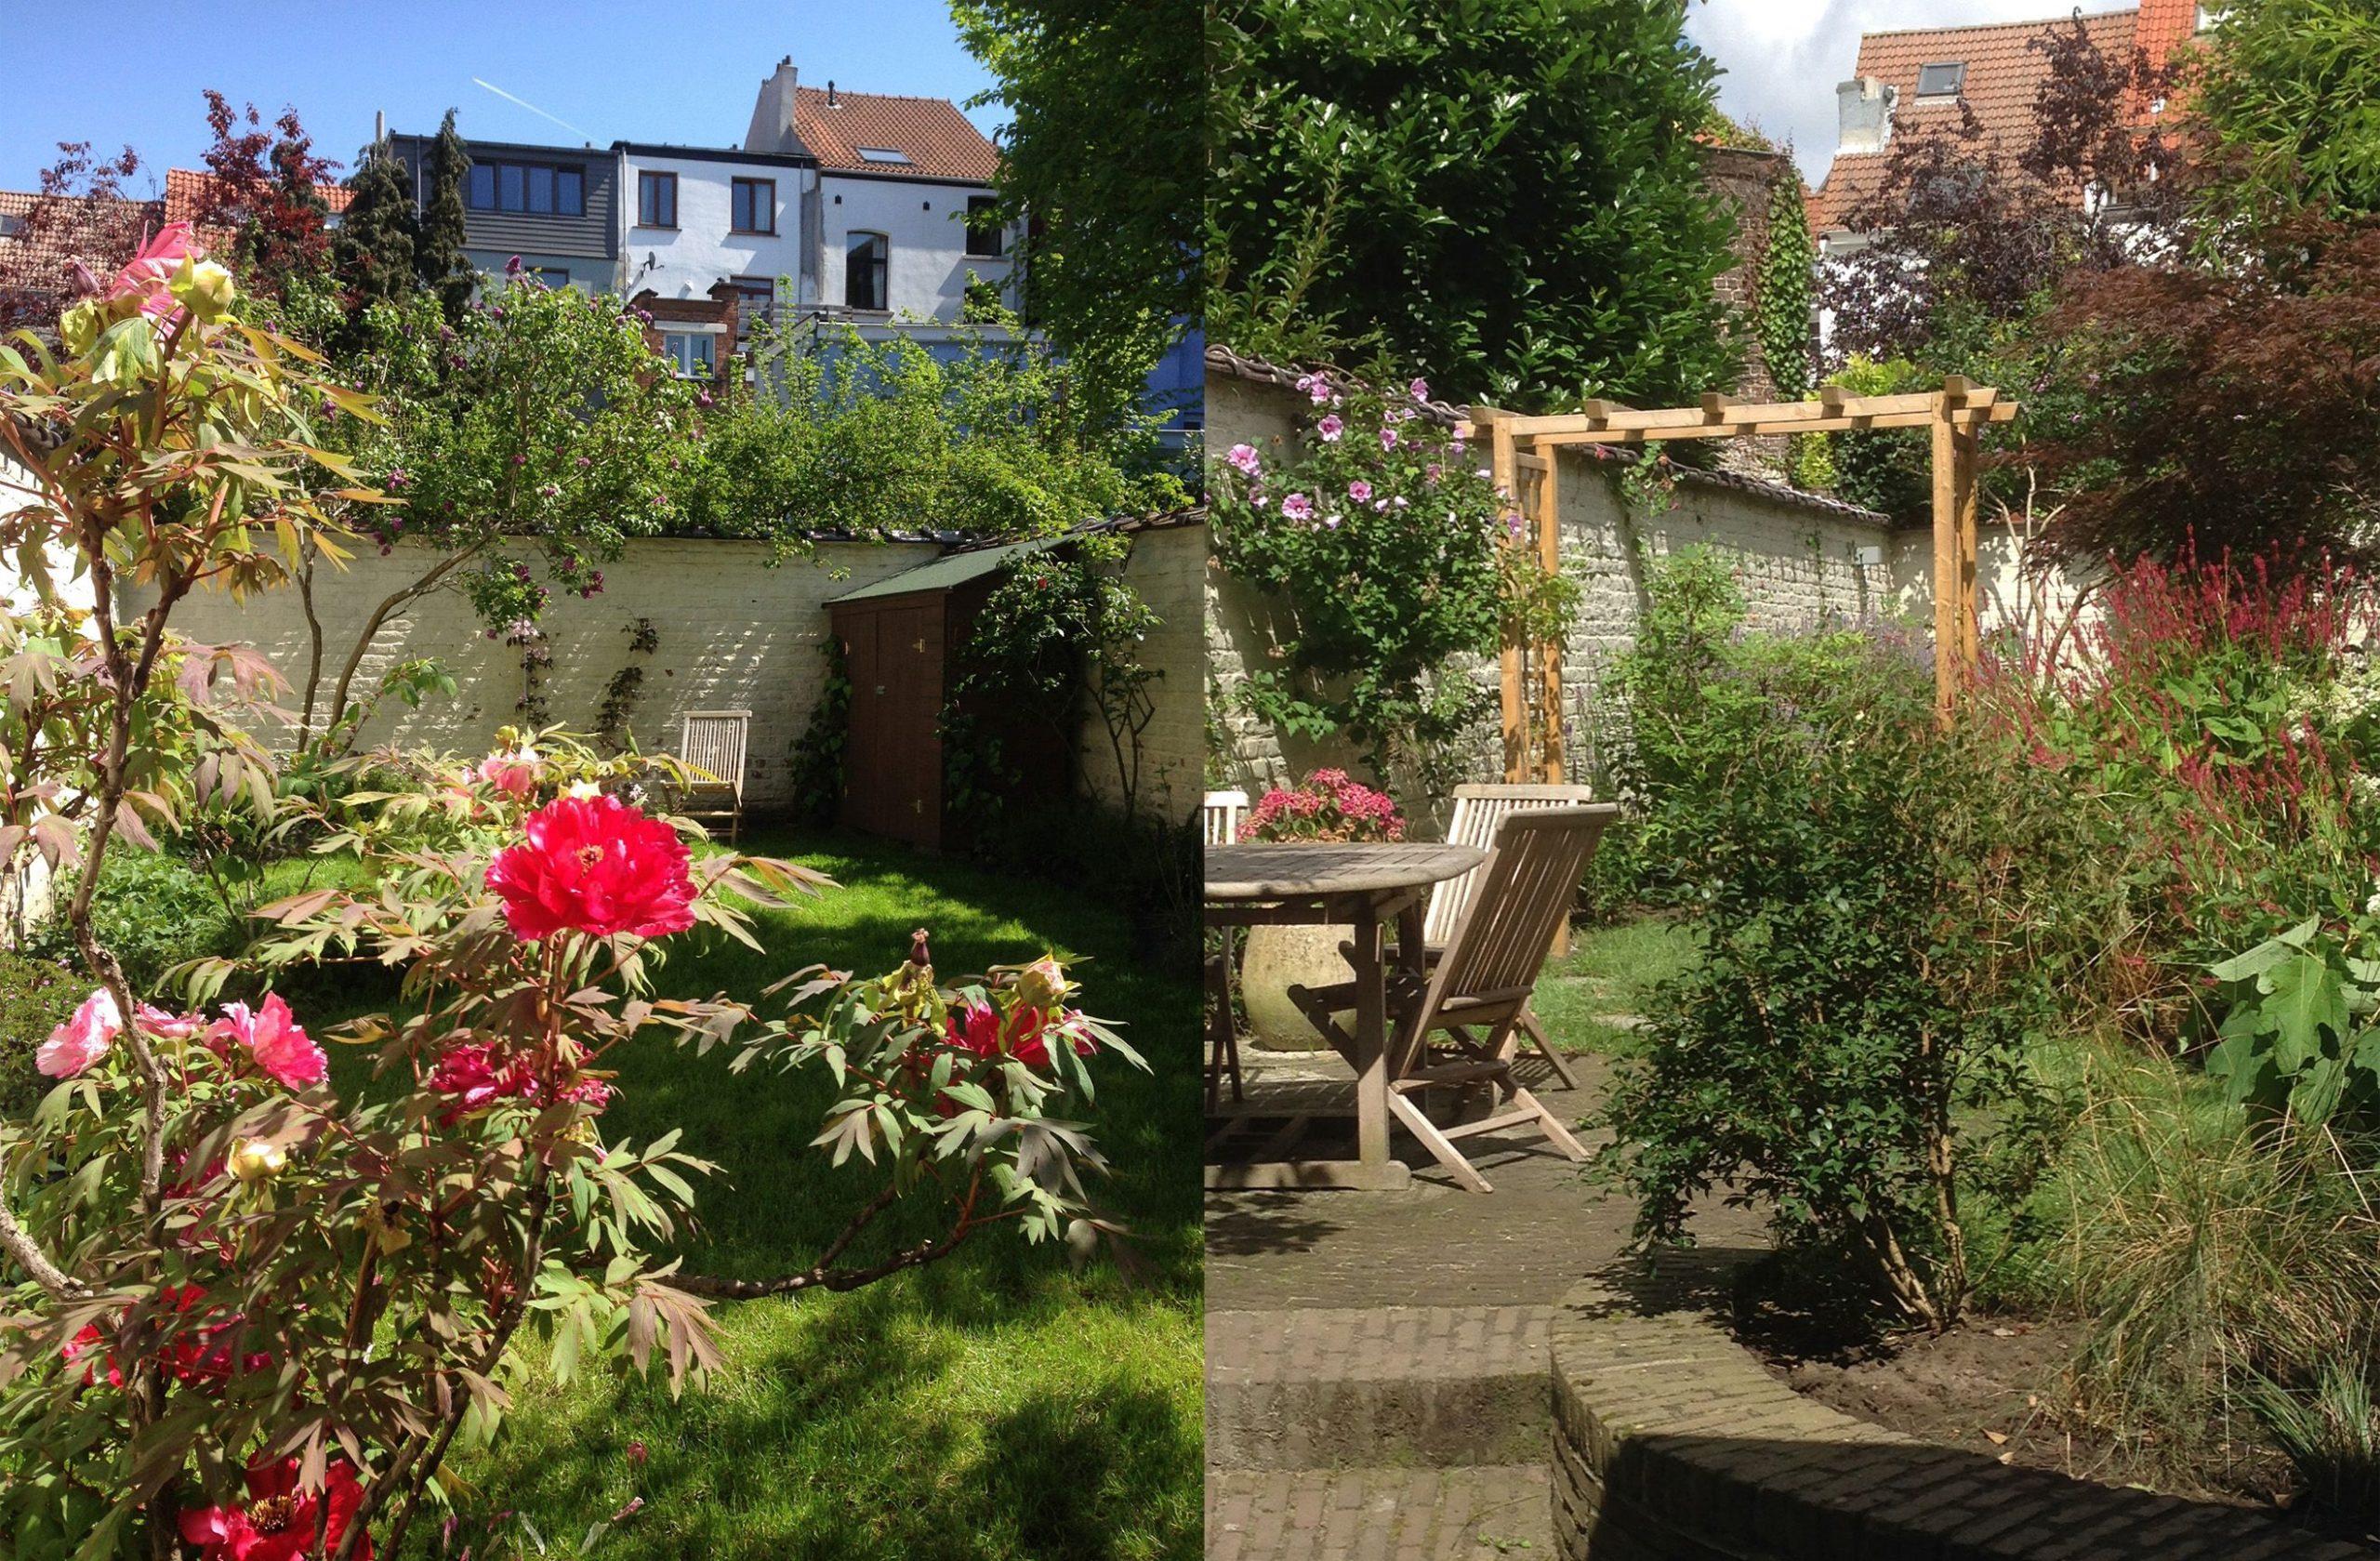 Jardin 100M2 - Bruxelles/ Marguerite Ferry - Urban Garden ... concernant Arceau Jardin